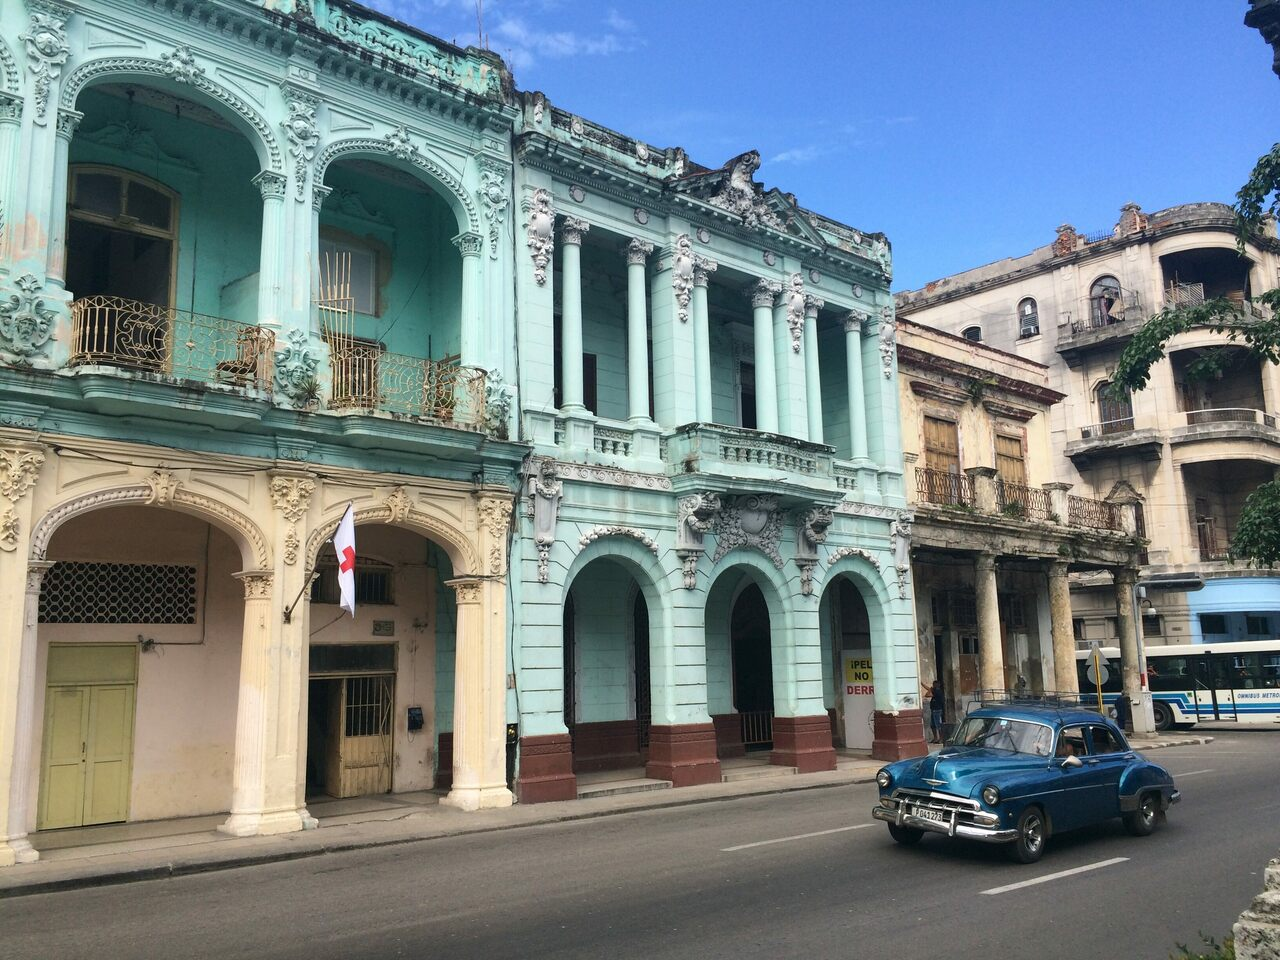 Centro Habana heading towards the Barrio Chino, home of the old Shanghai Theatre.